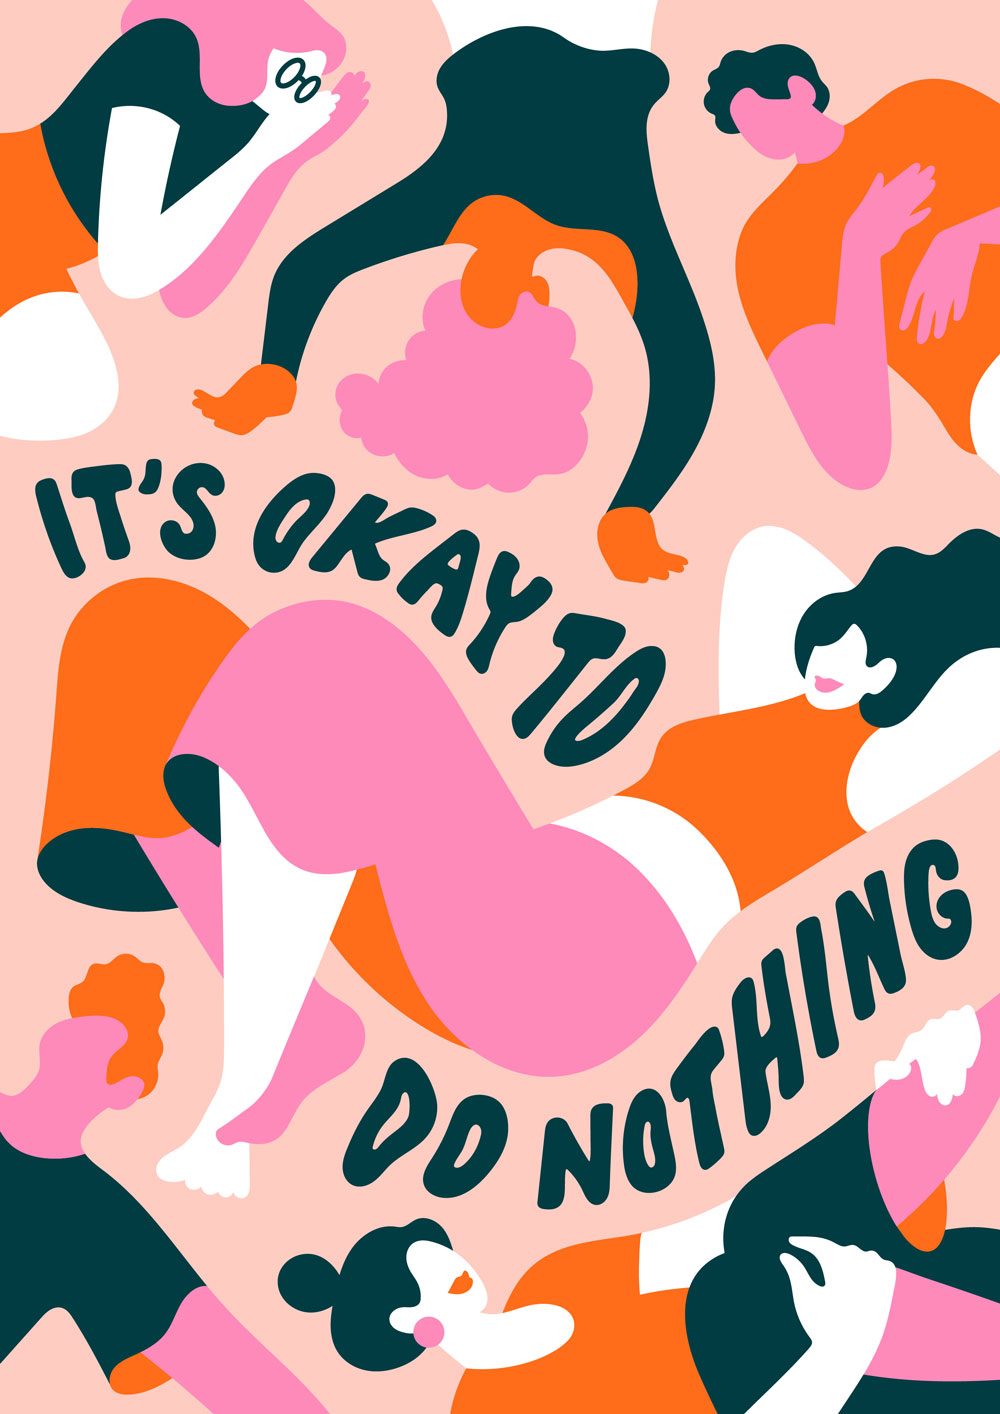 """It's Okay To Do Nothing"" illustration by Lisa Tegtmeier"